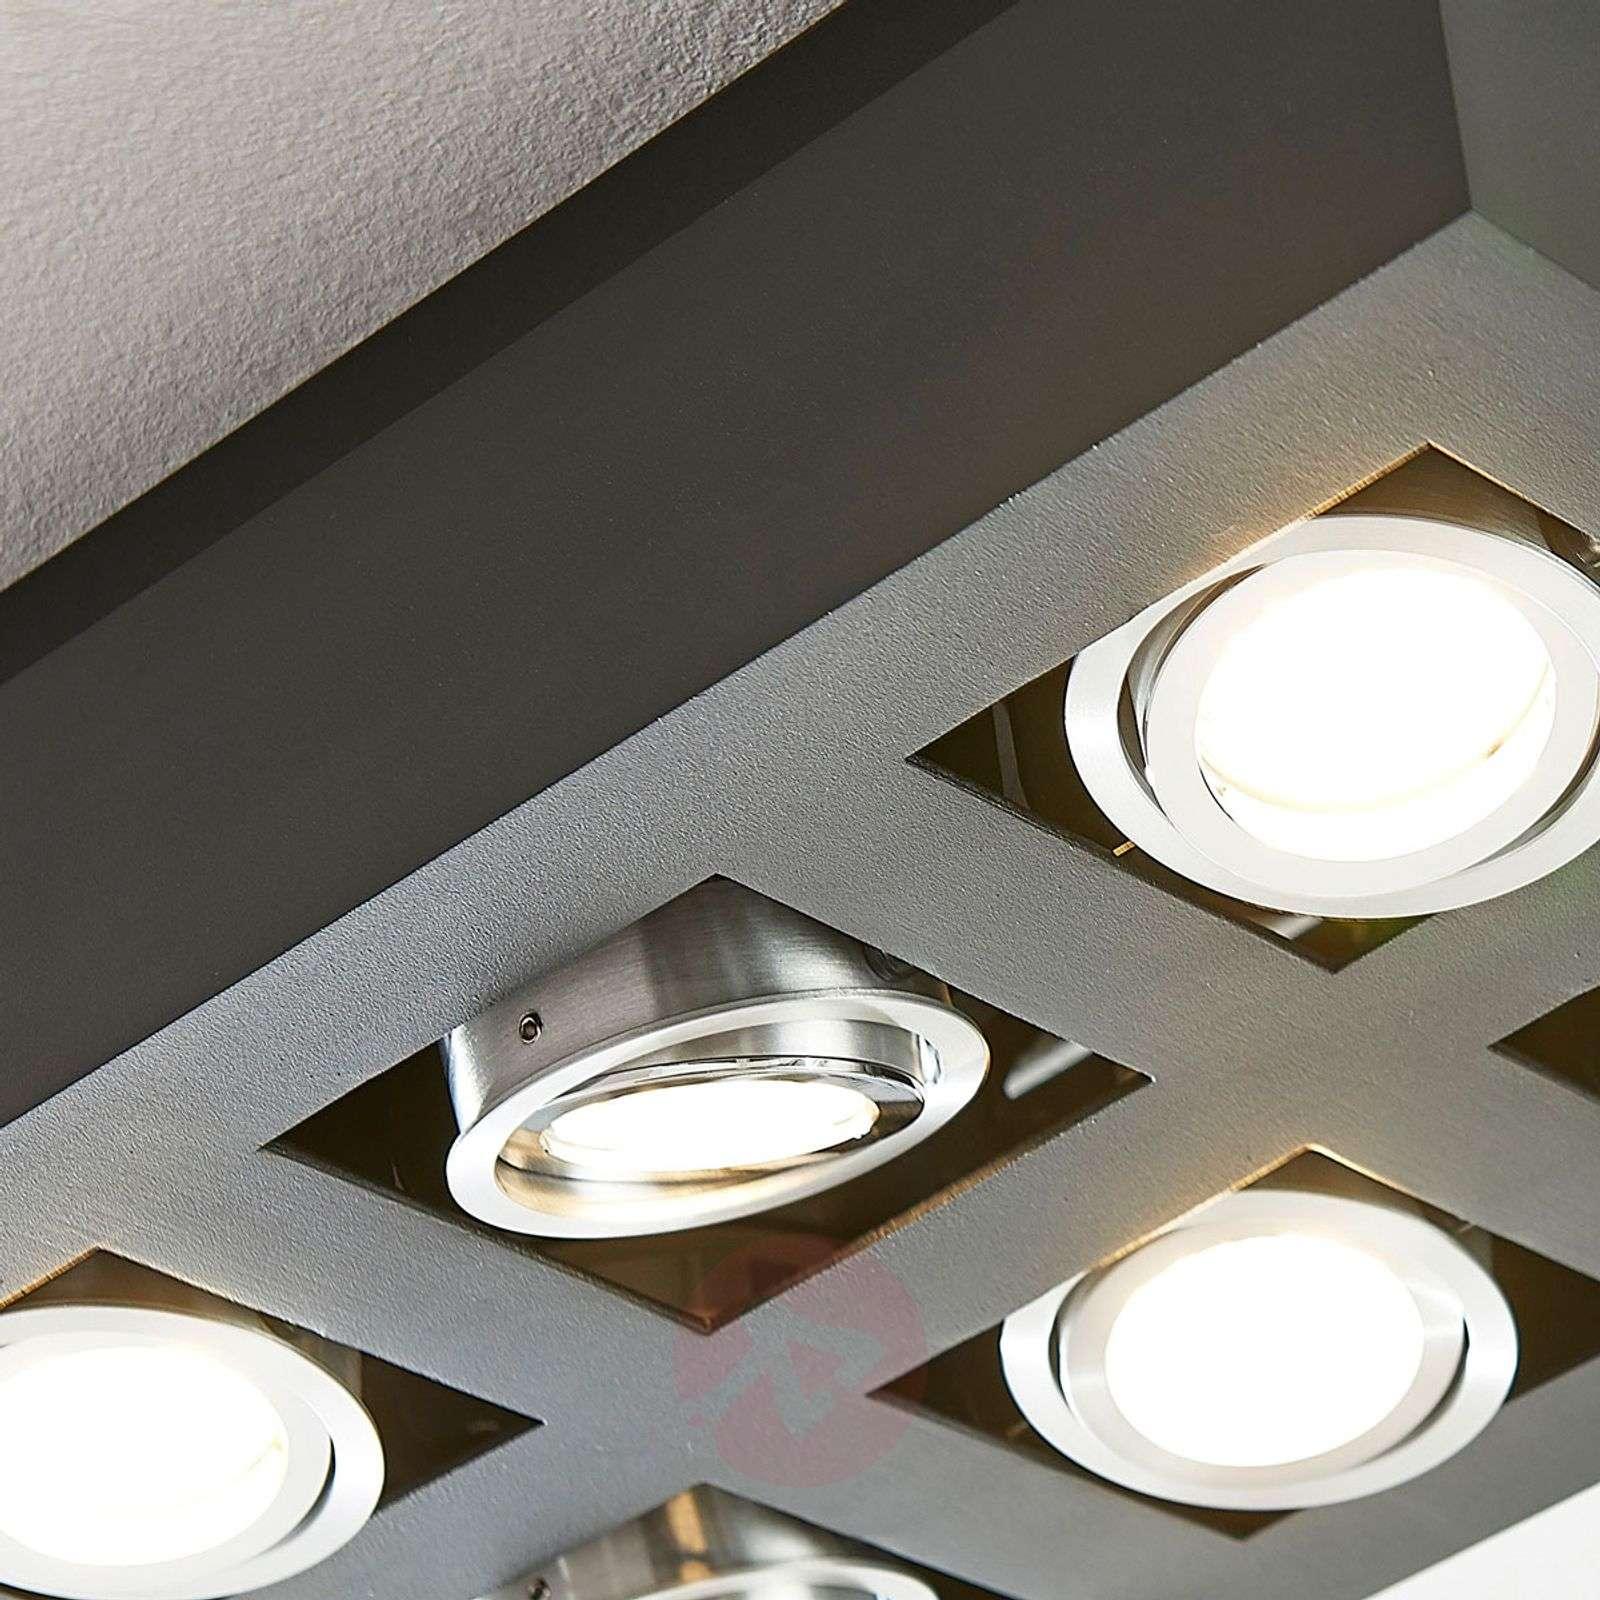 LED-kattolamppu Vince, 36 x 25 cm musta-9621711-01